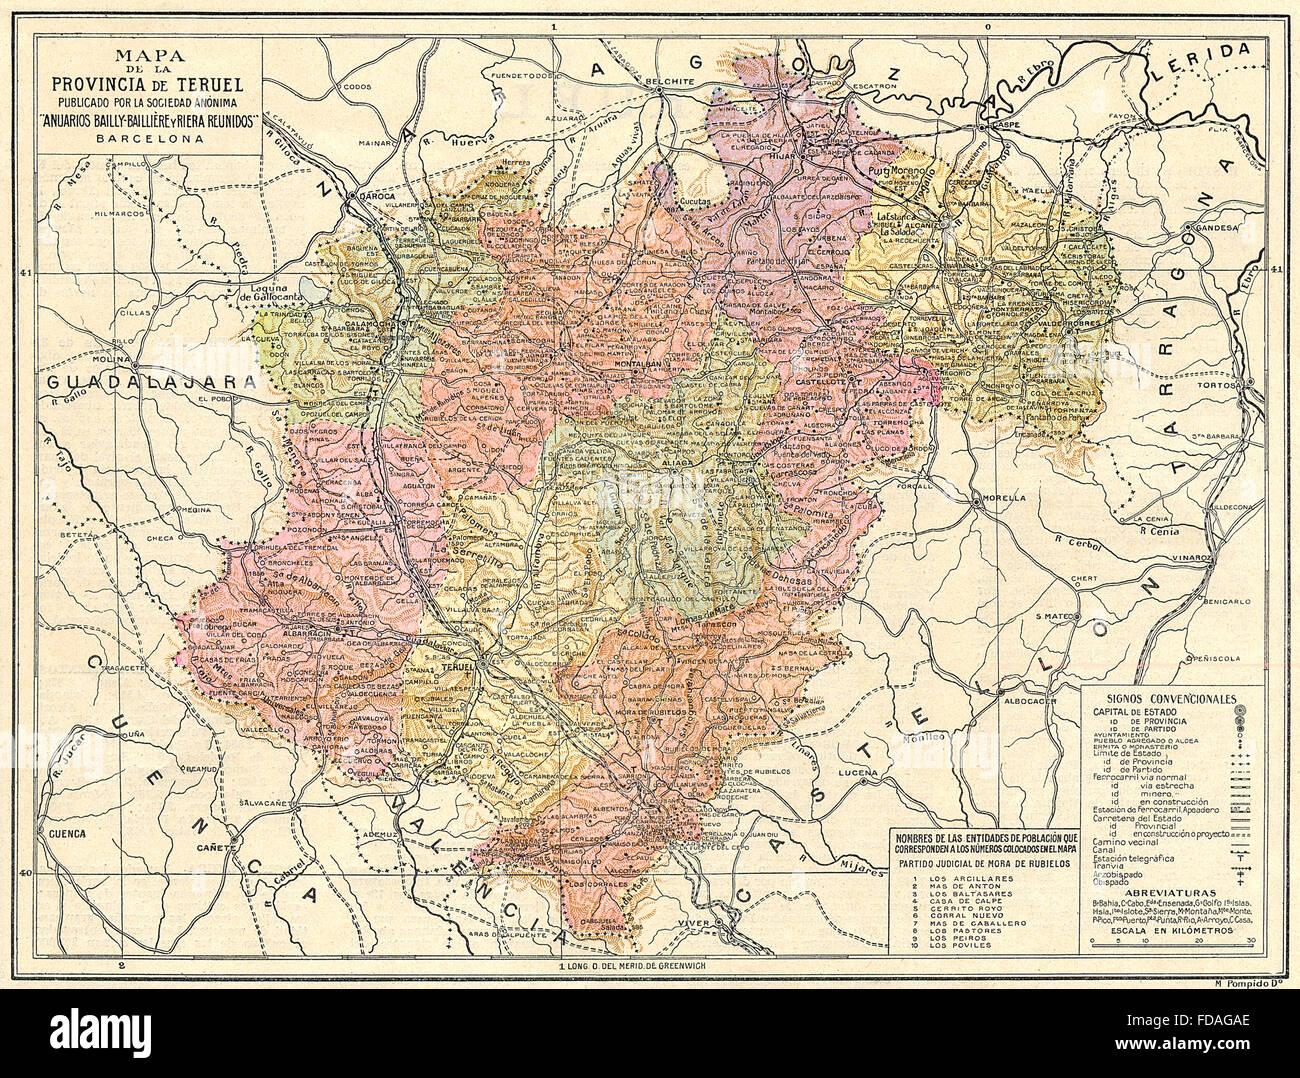 Mapa De Teruel Aragon Espana